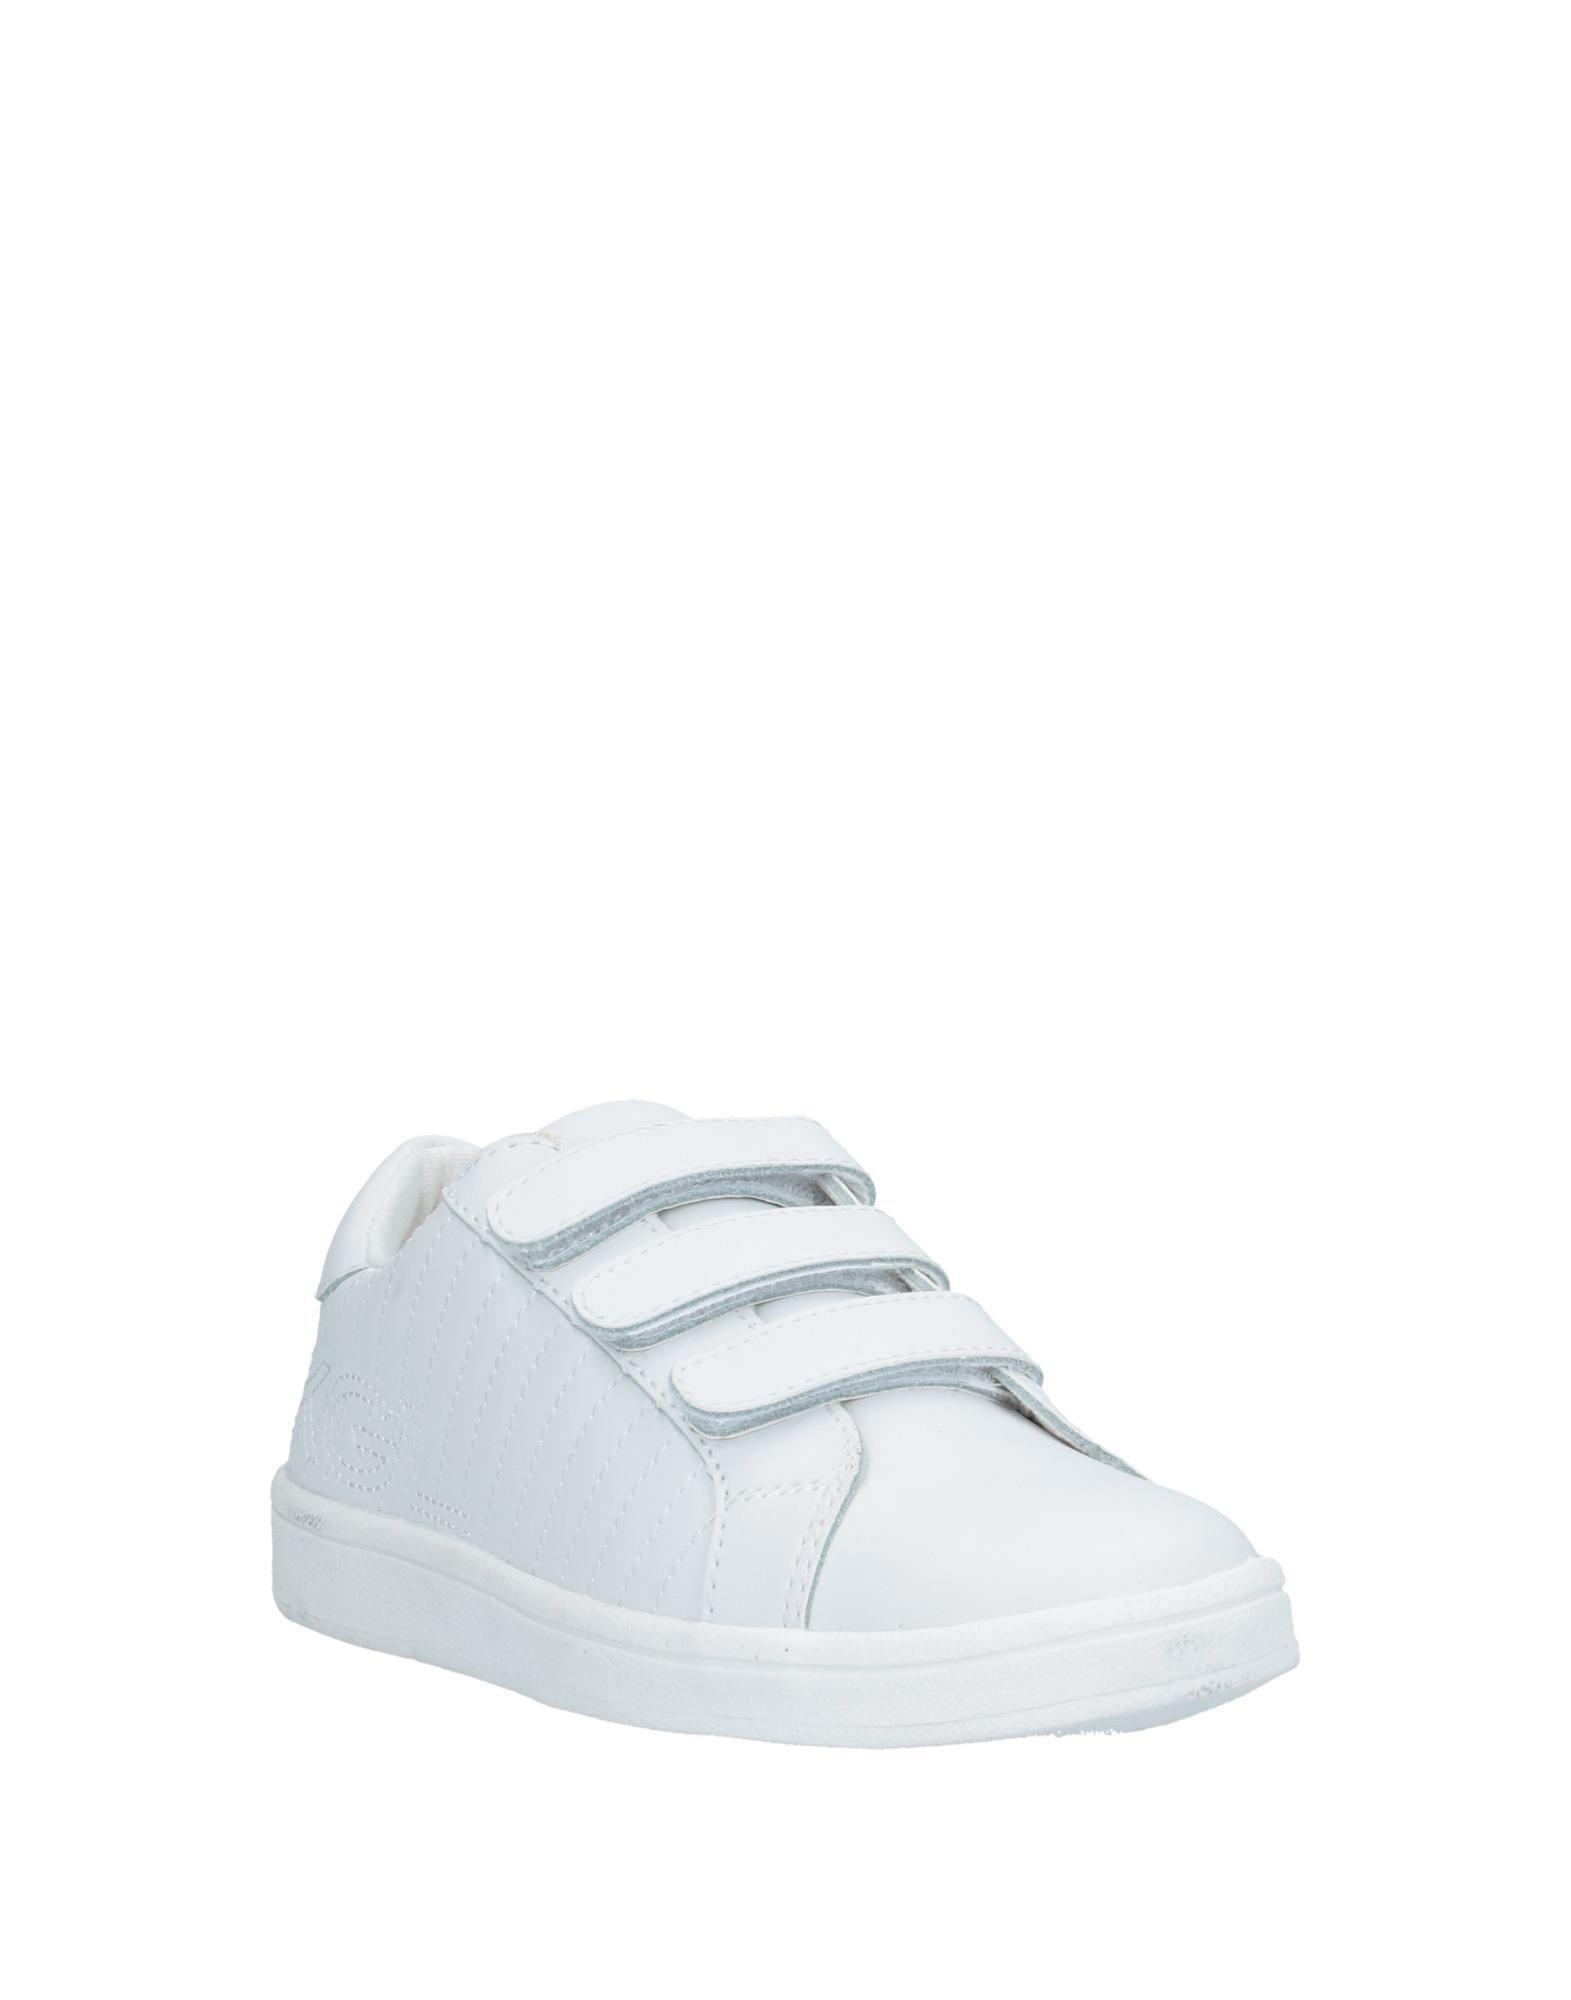 FOOTWEAR Boy Kurt Geiger White Leather